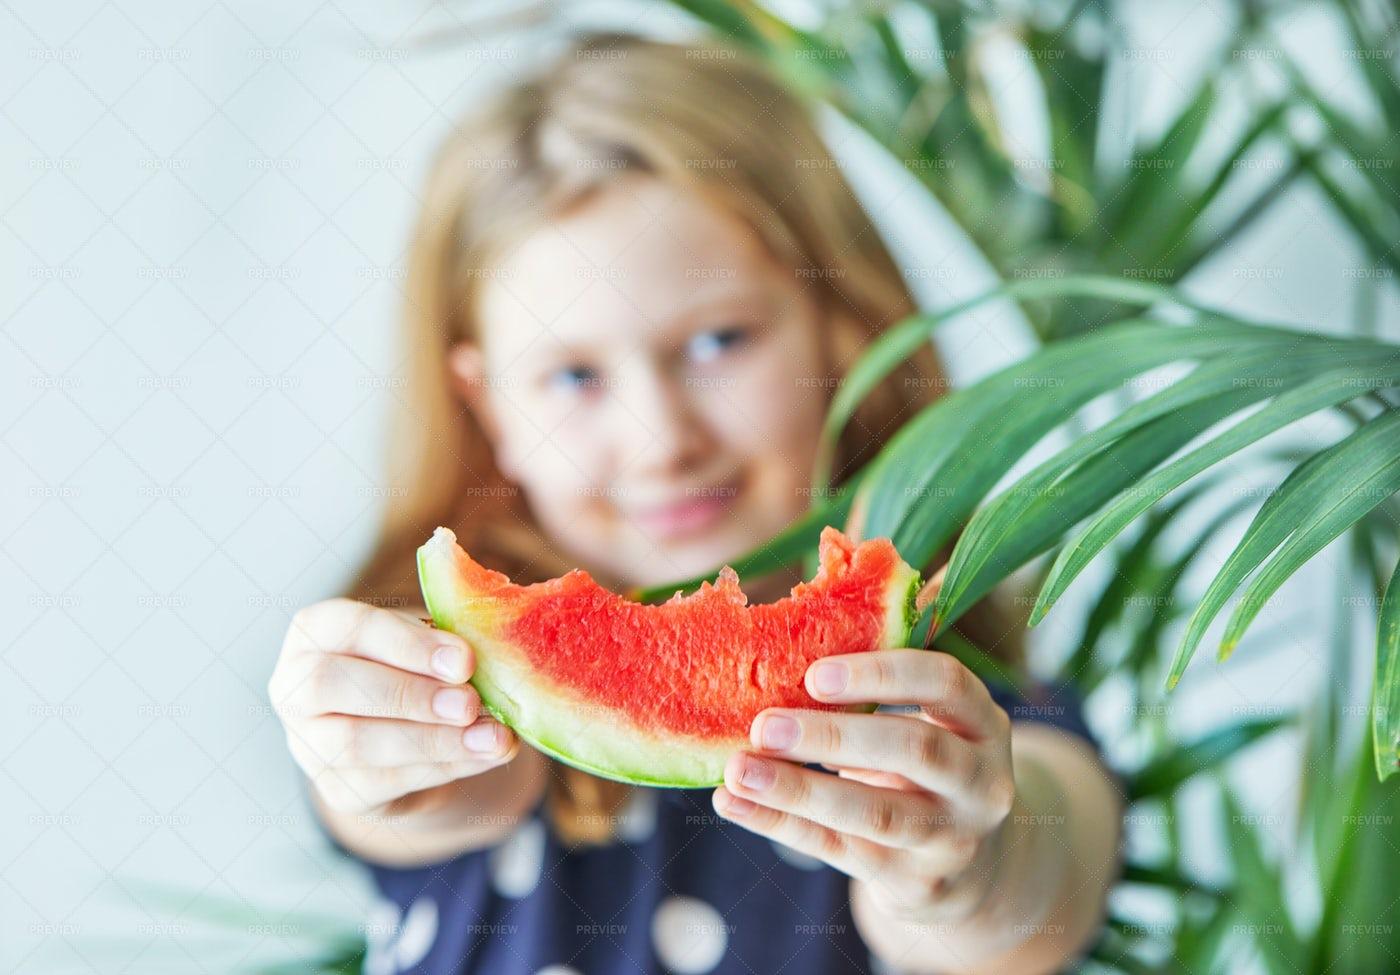 Teenage Girl With Watermelon: Stock Photos